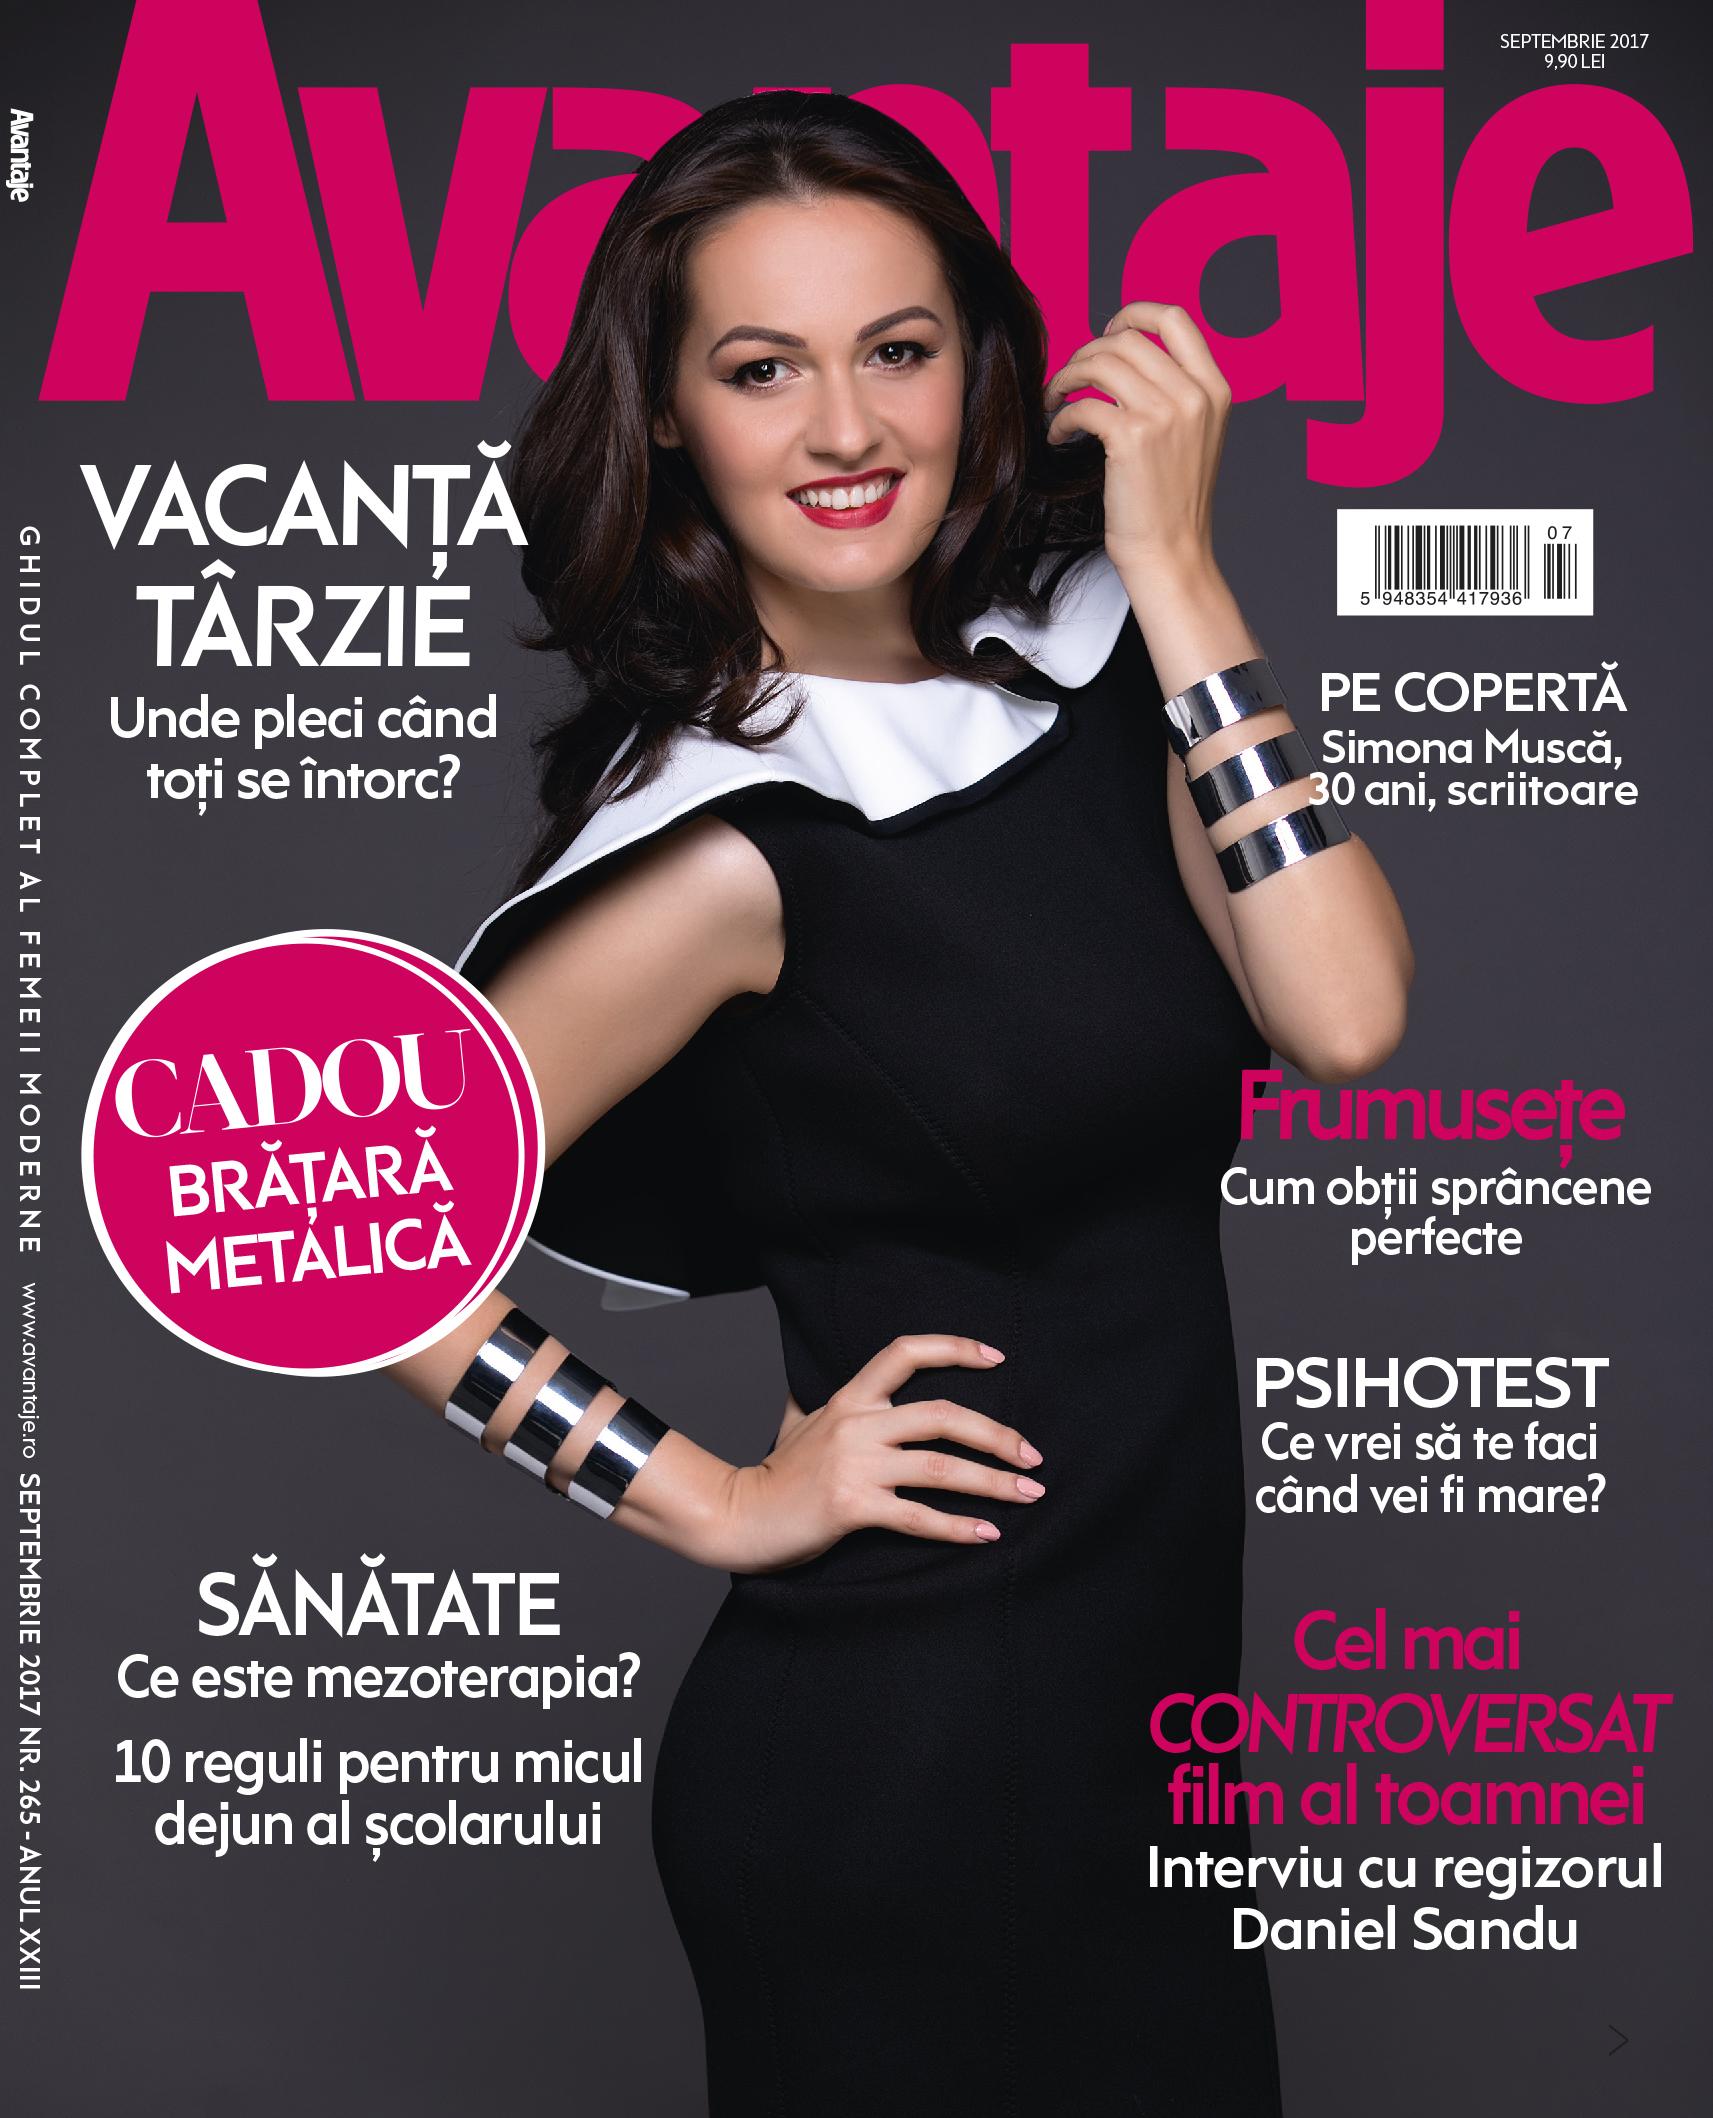 cover avantaje septembrie 2017